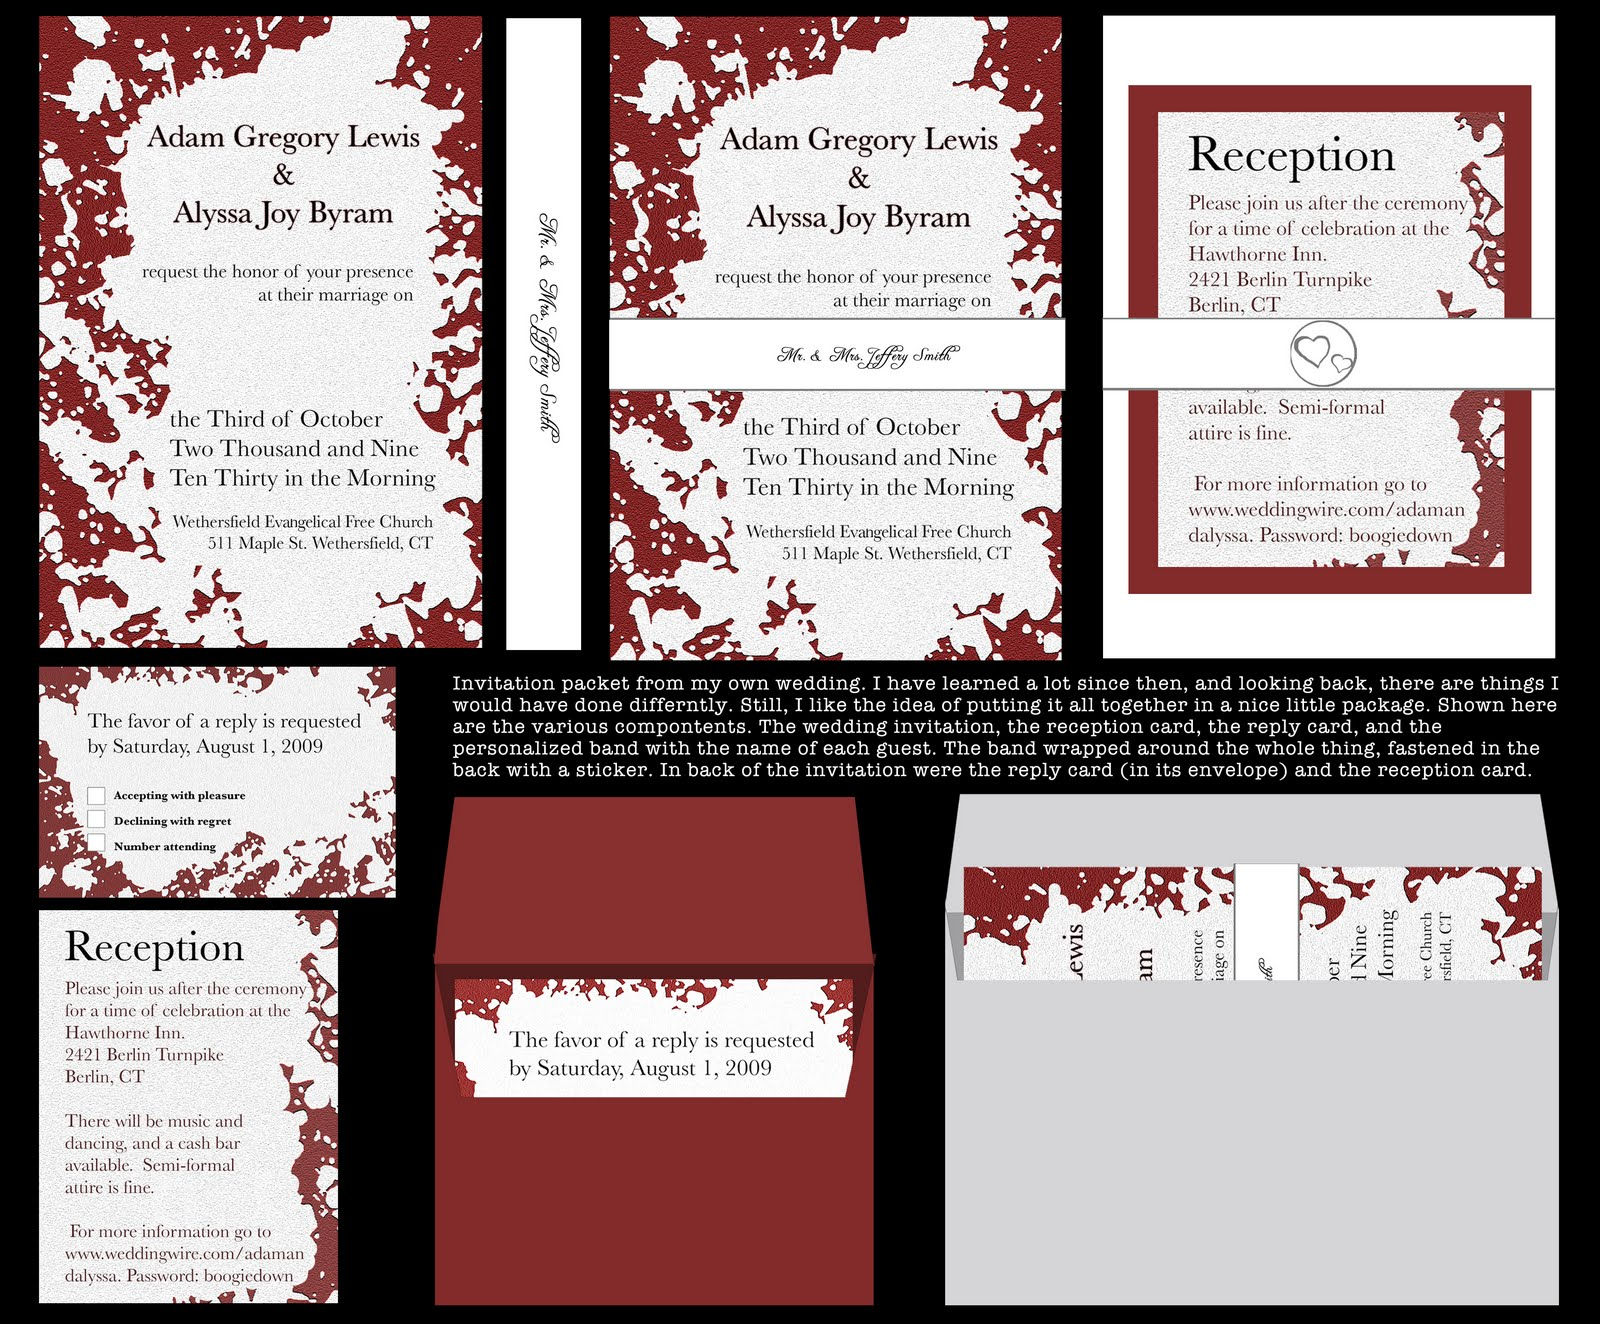 wedding invitation packet - 28 images - personalized oak tree ...